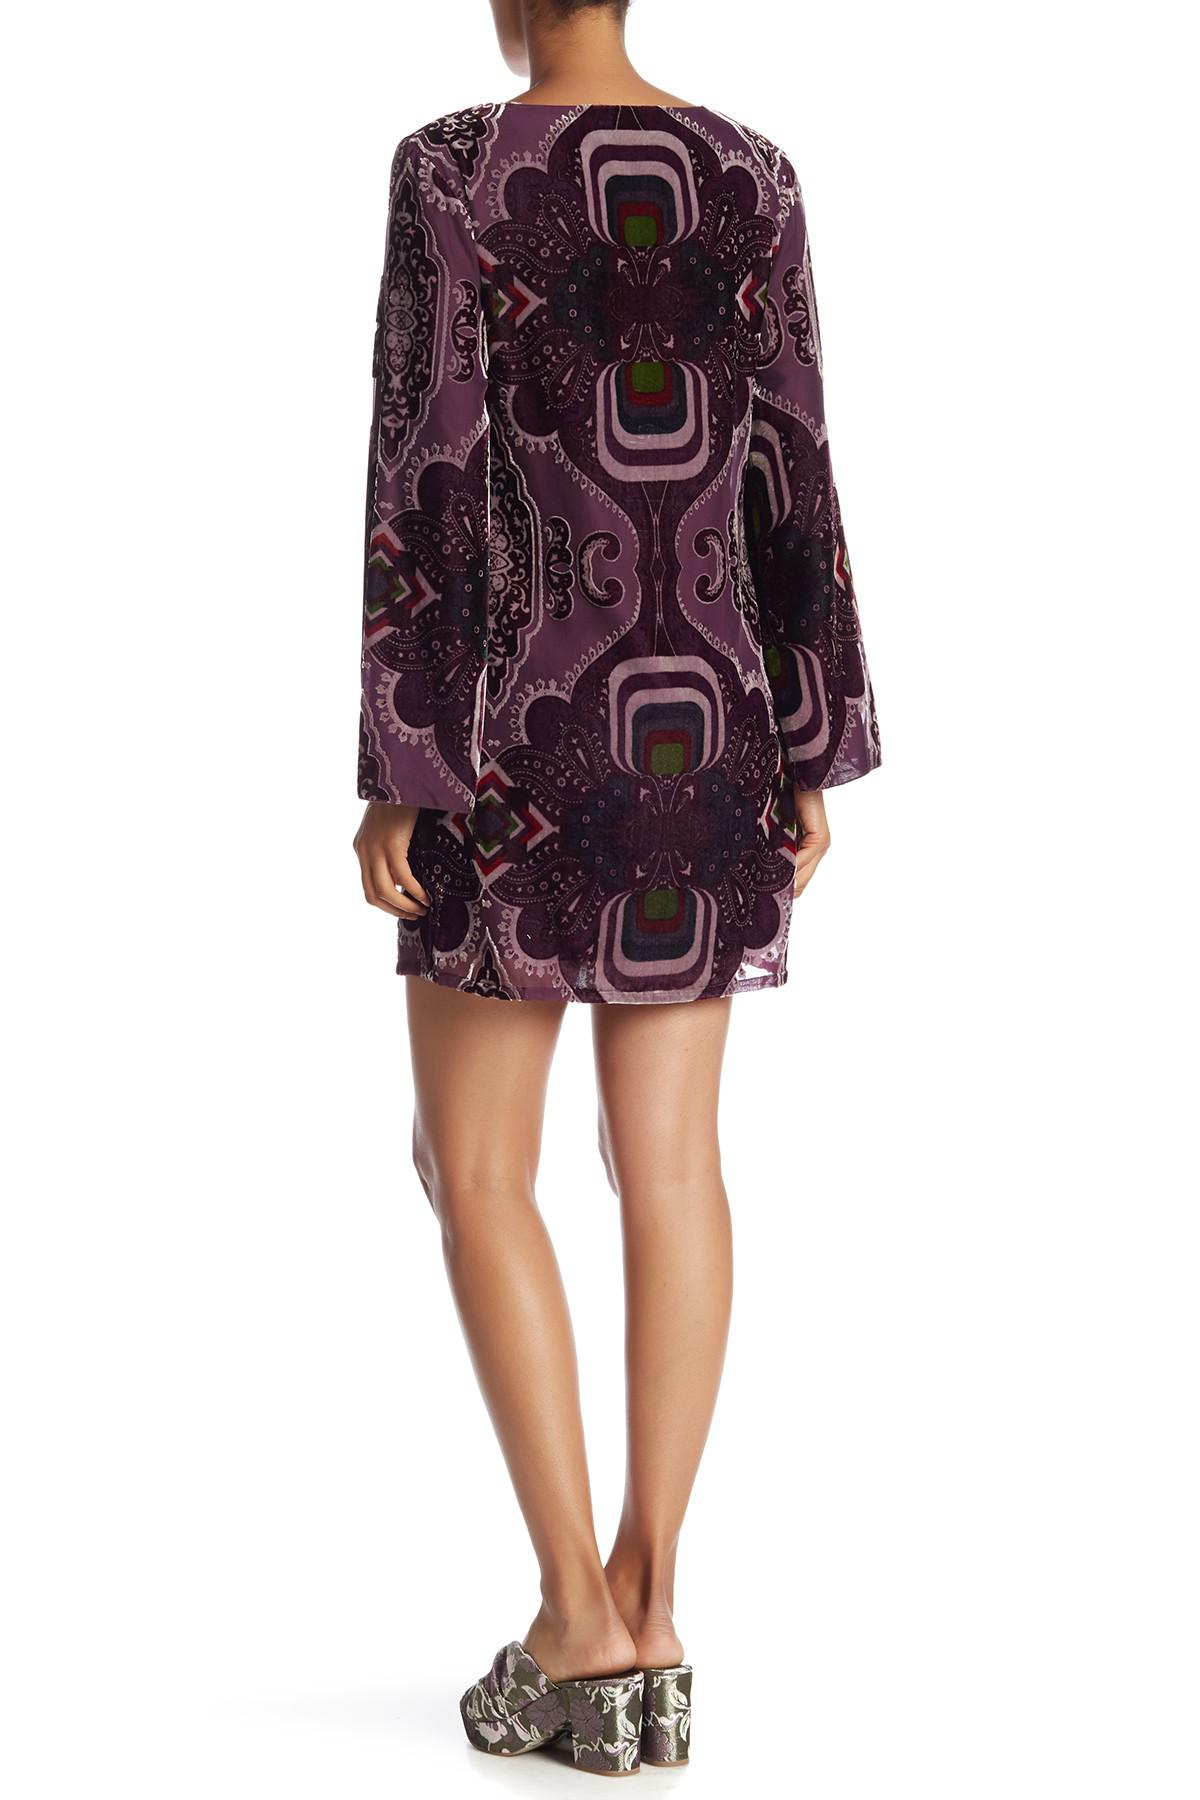 7c56ac874e092 Lyst - Desigual Celia Velvet Dress in Purple